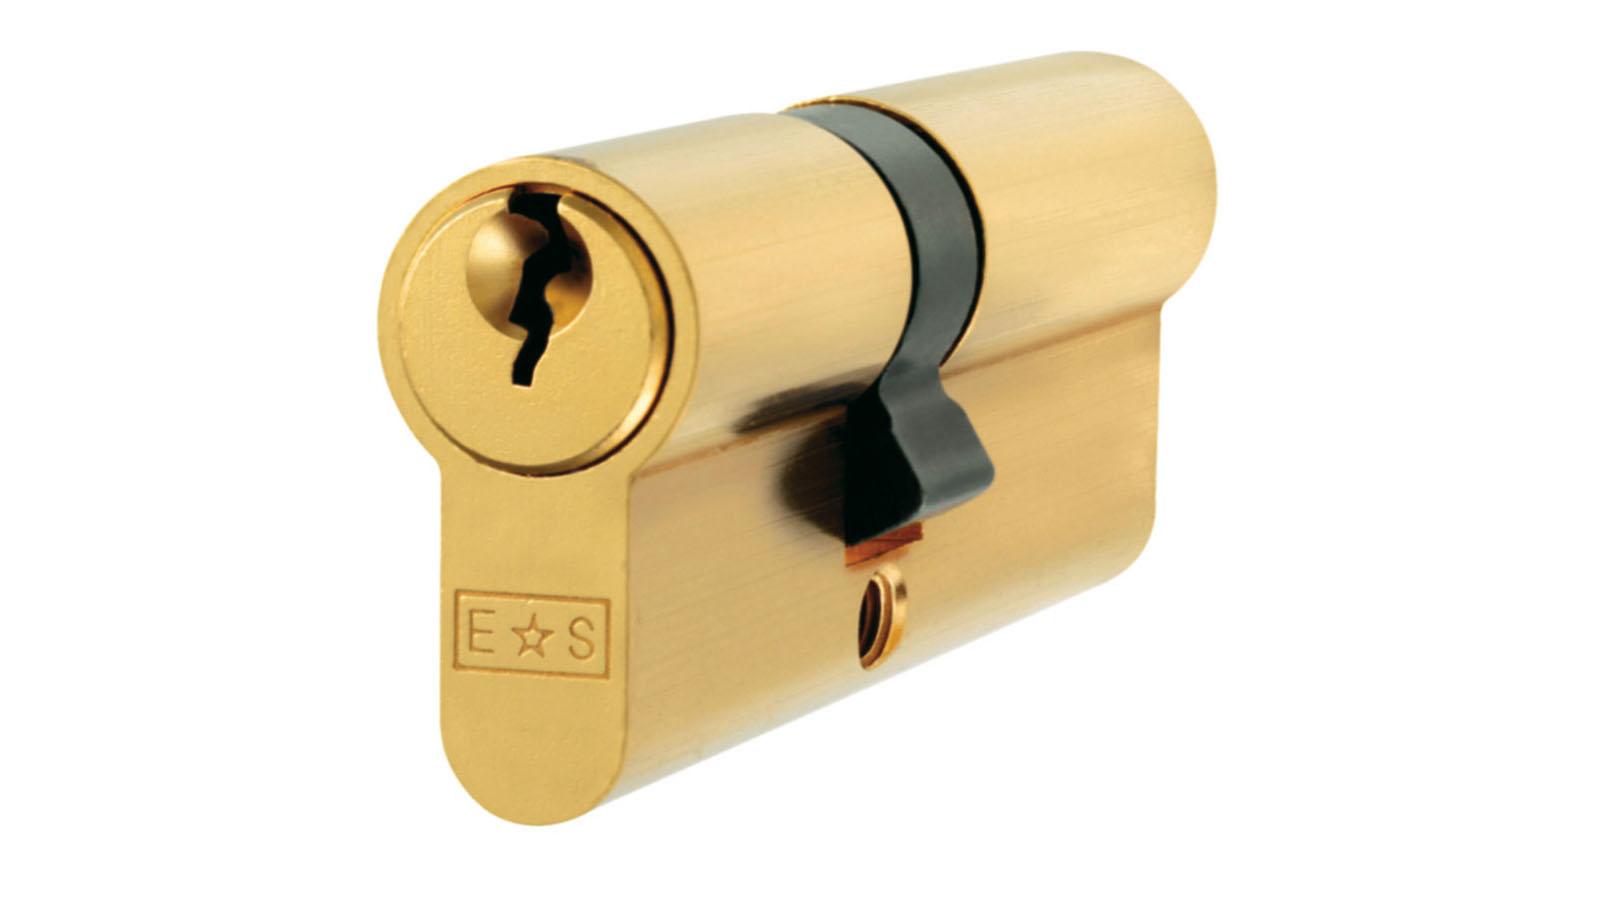 Euro Cylinders Lockwizard Locksmith